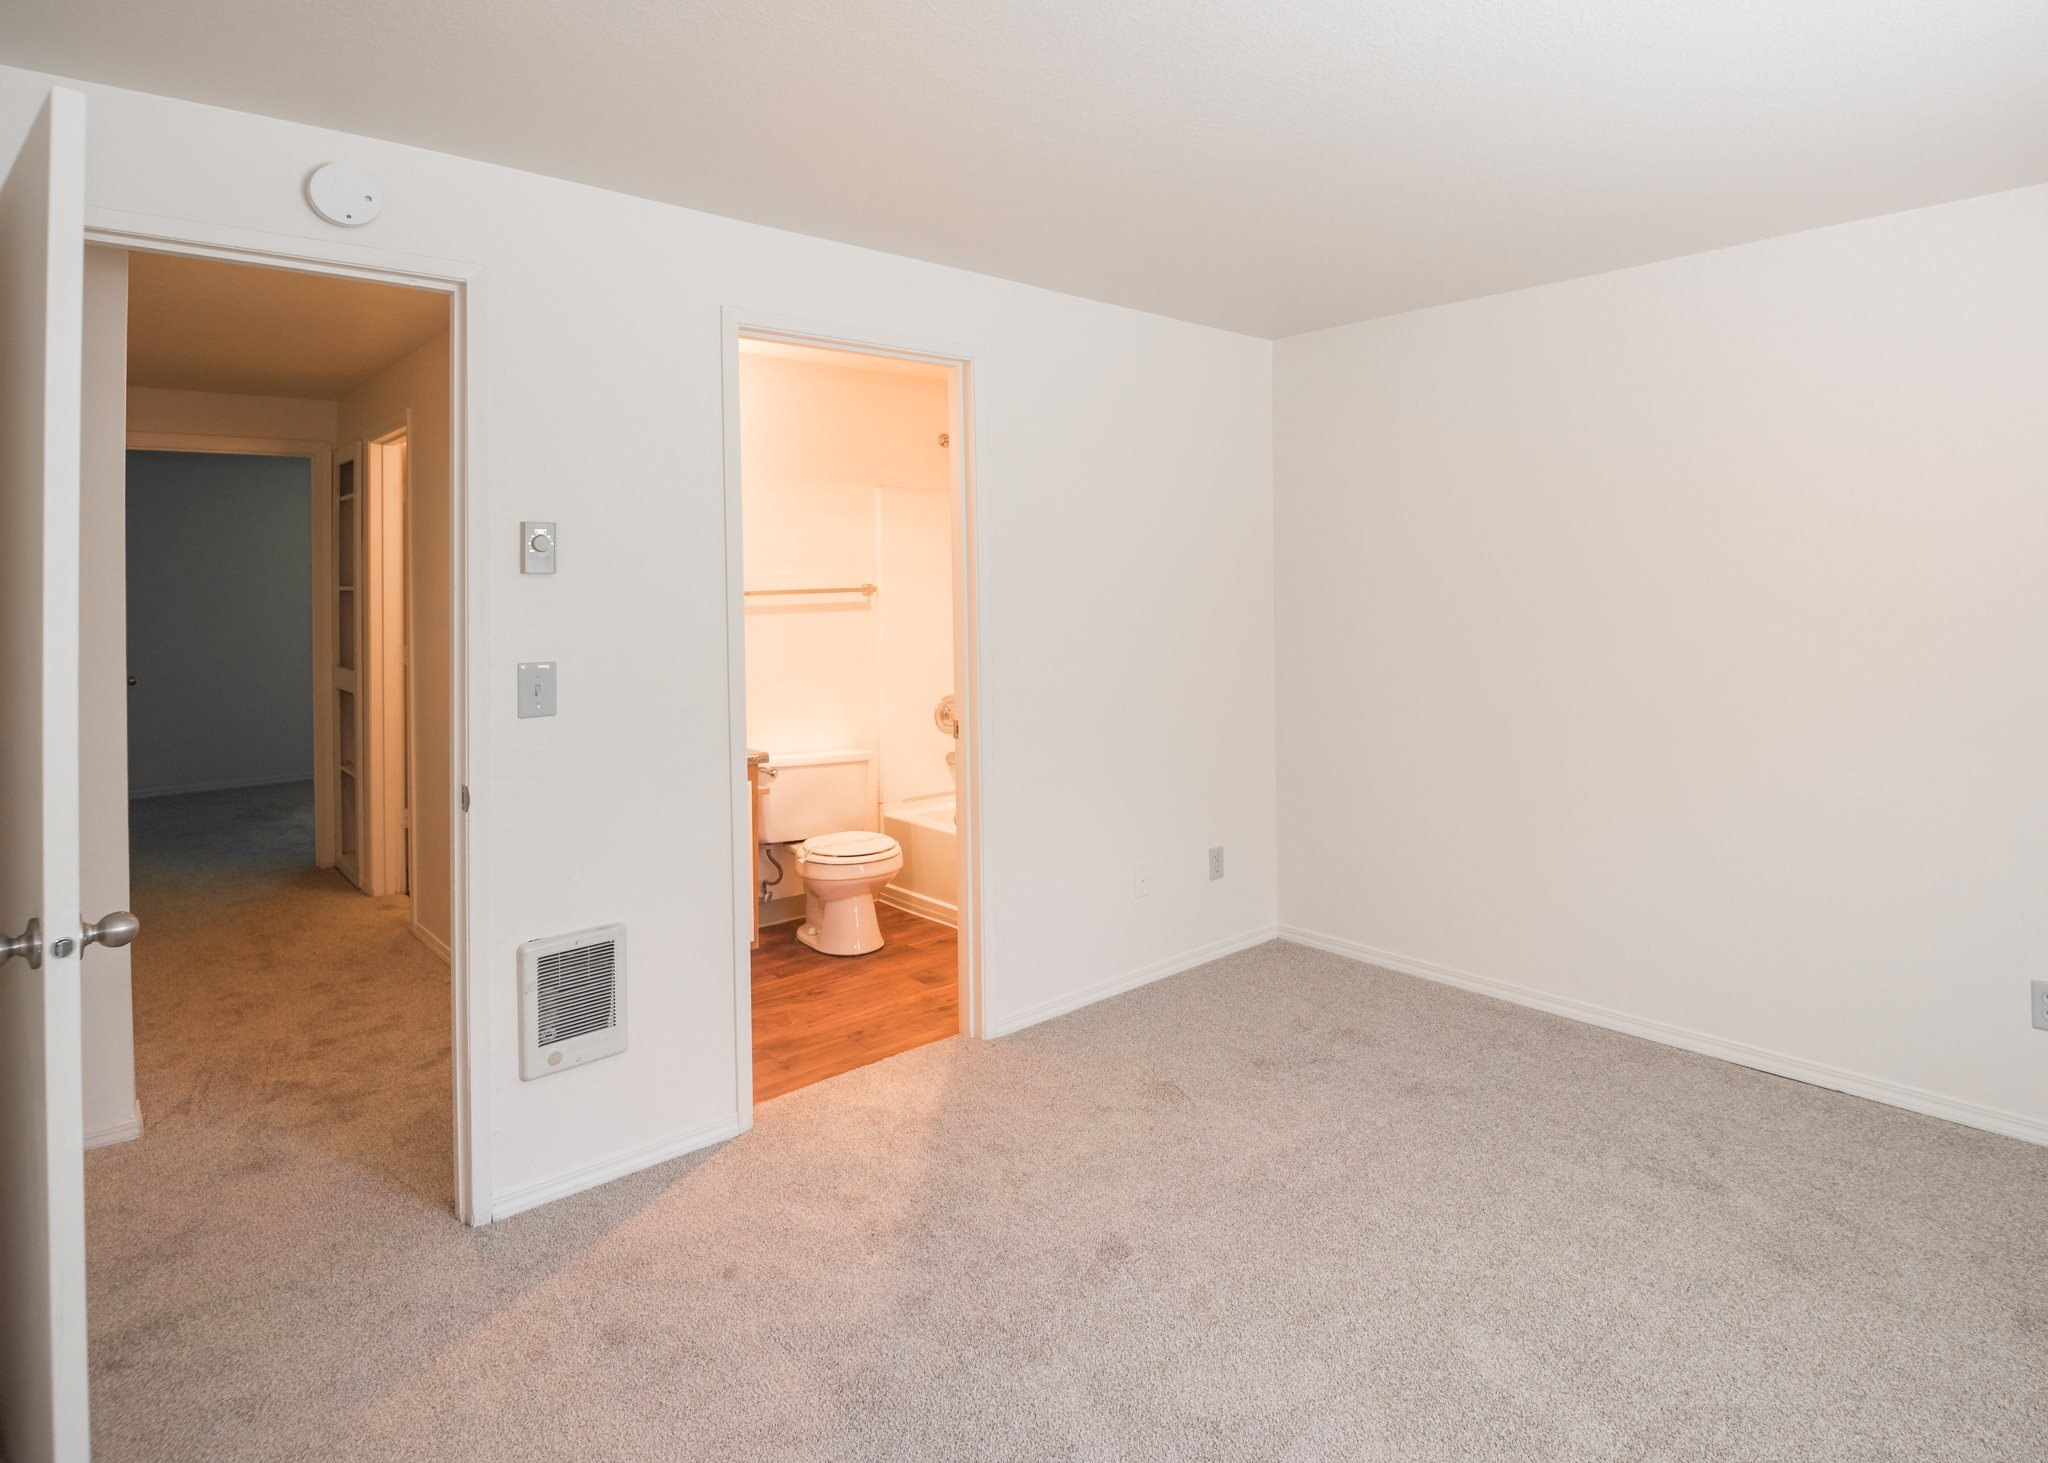 Shadow Hills Vacant Apartment New Master Bedroom & Bathroom